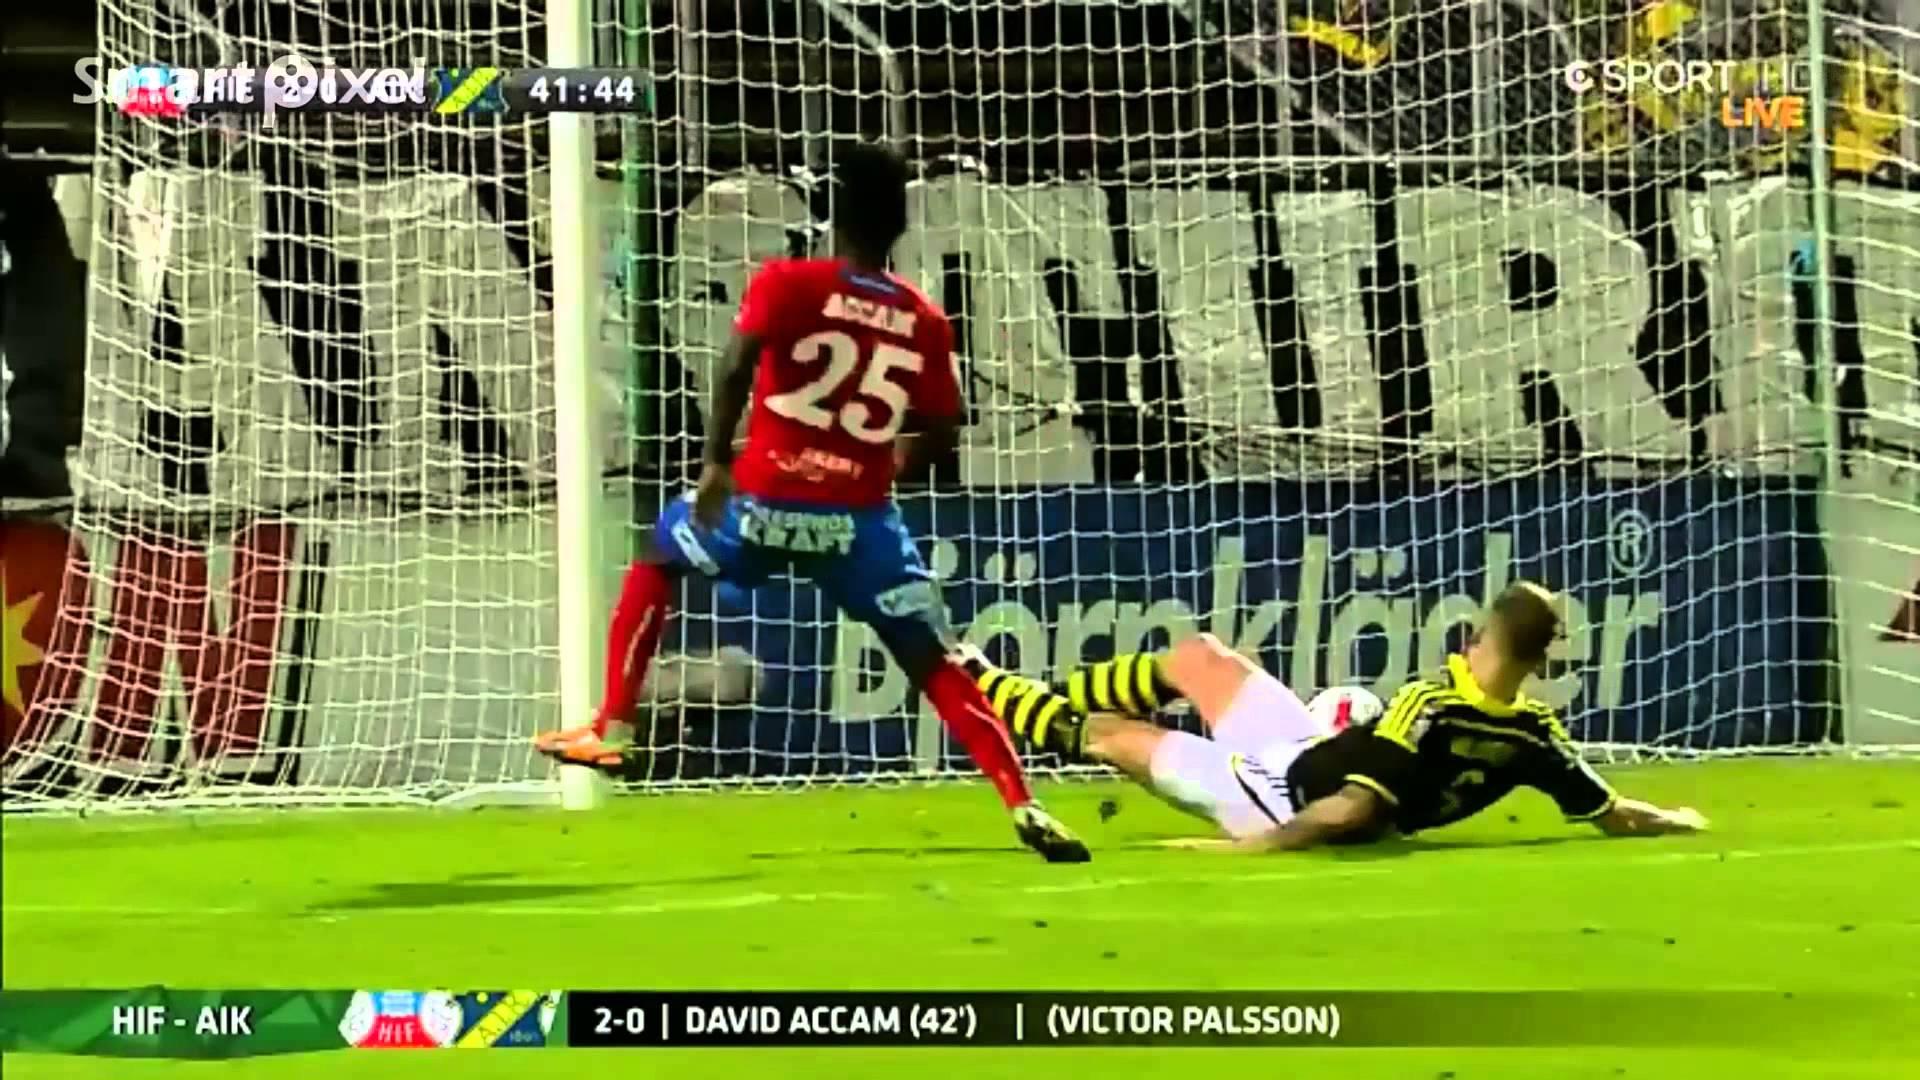 Video: Helsingborgs – AIK (3-1), Allsvenskan